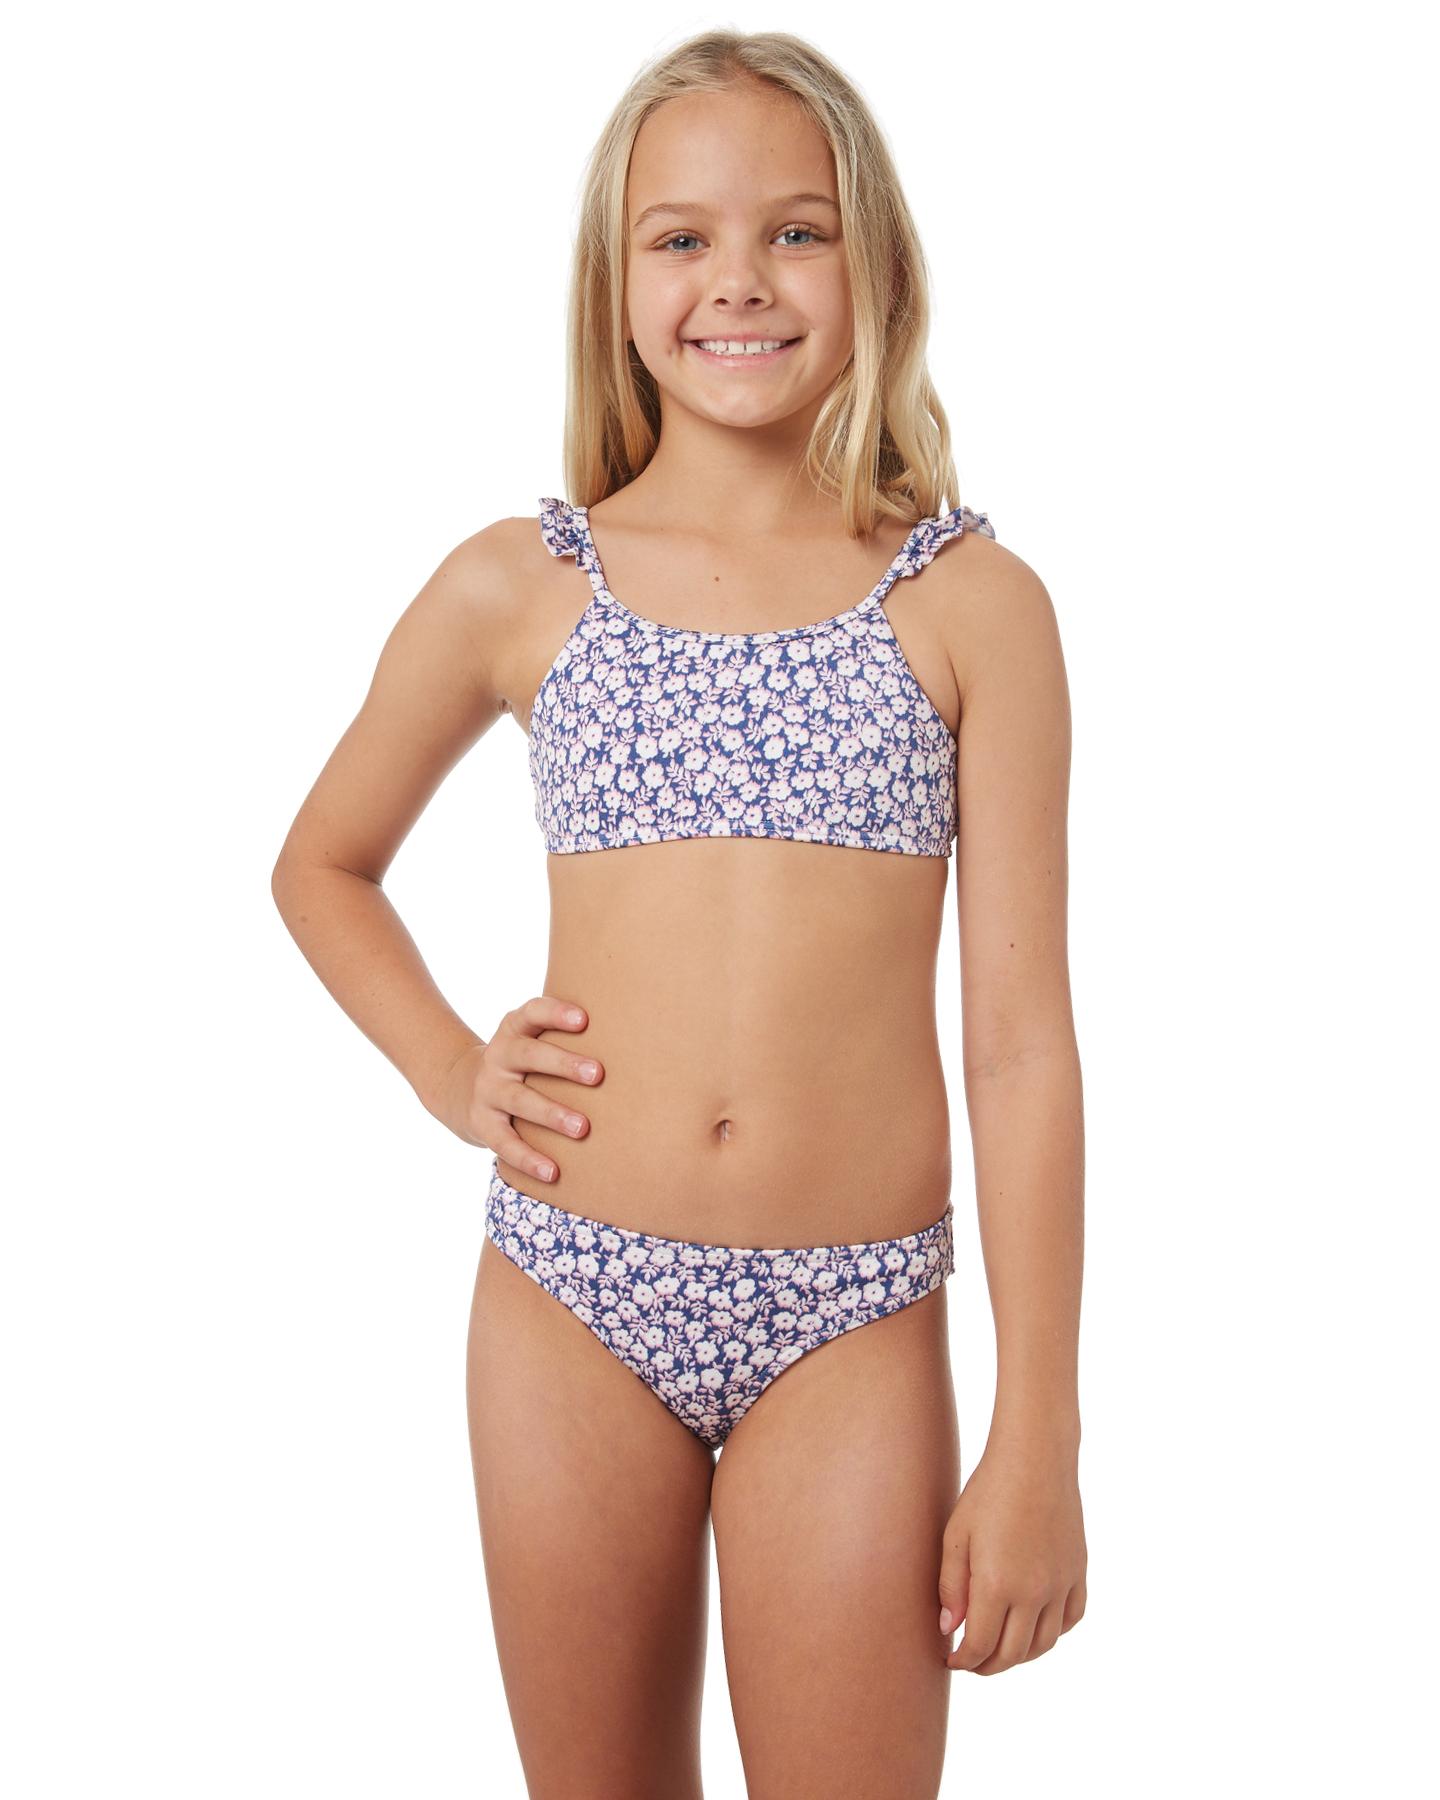 huge selection of 7bdf0 c1169 Girls Daisy Chain Bikini - Teens